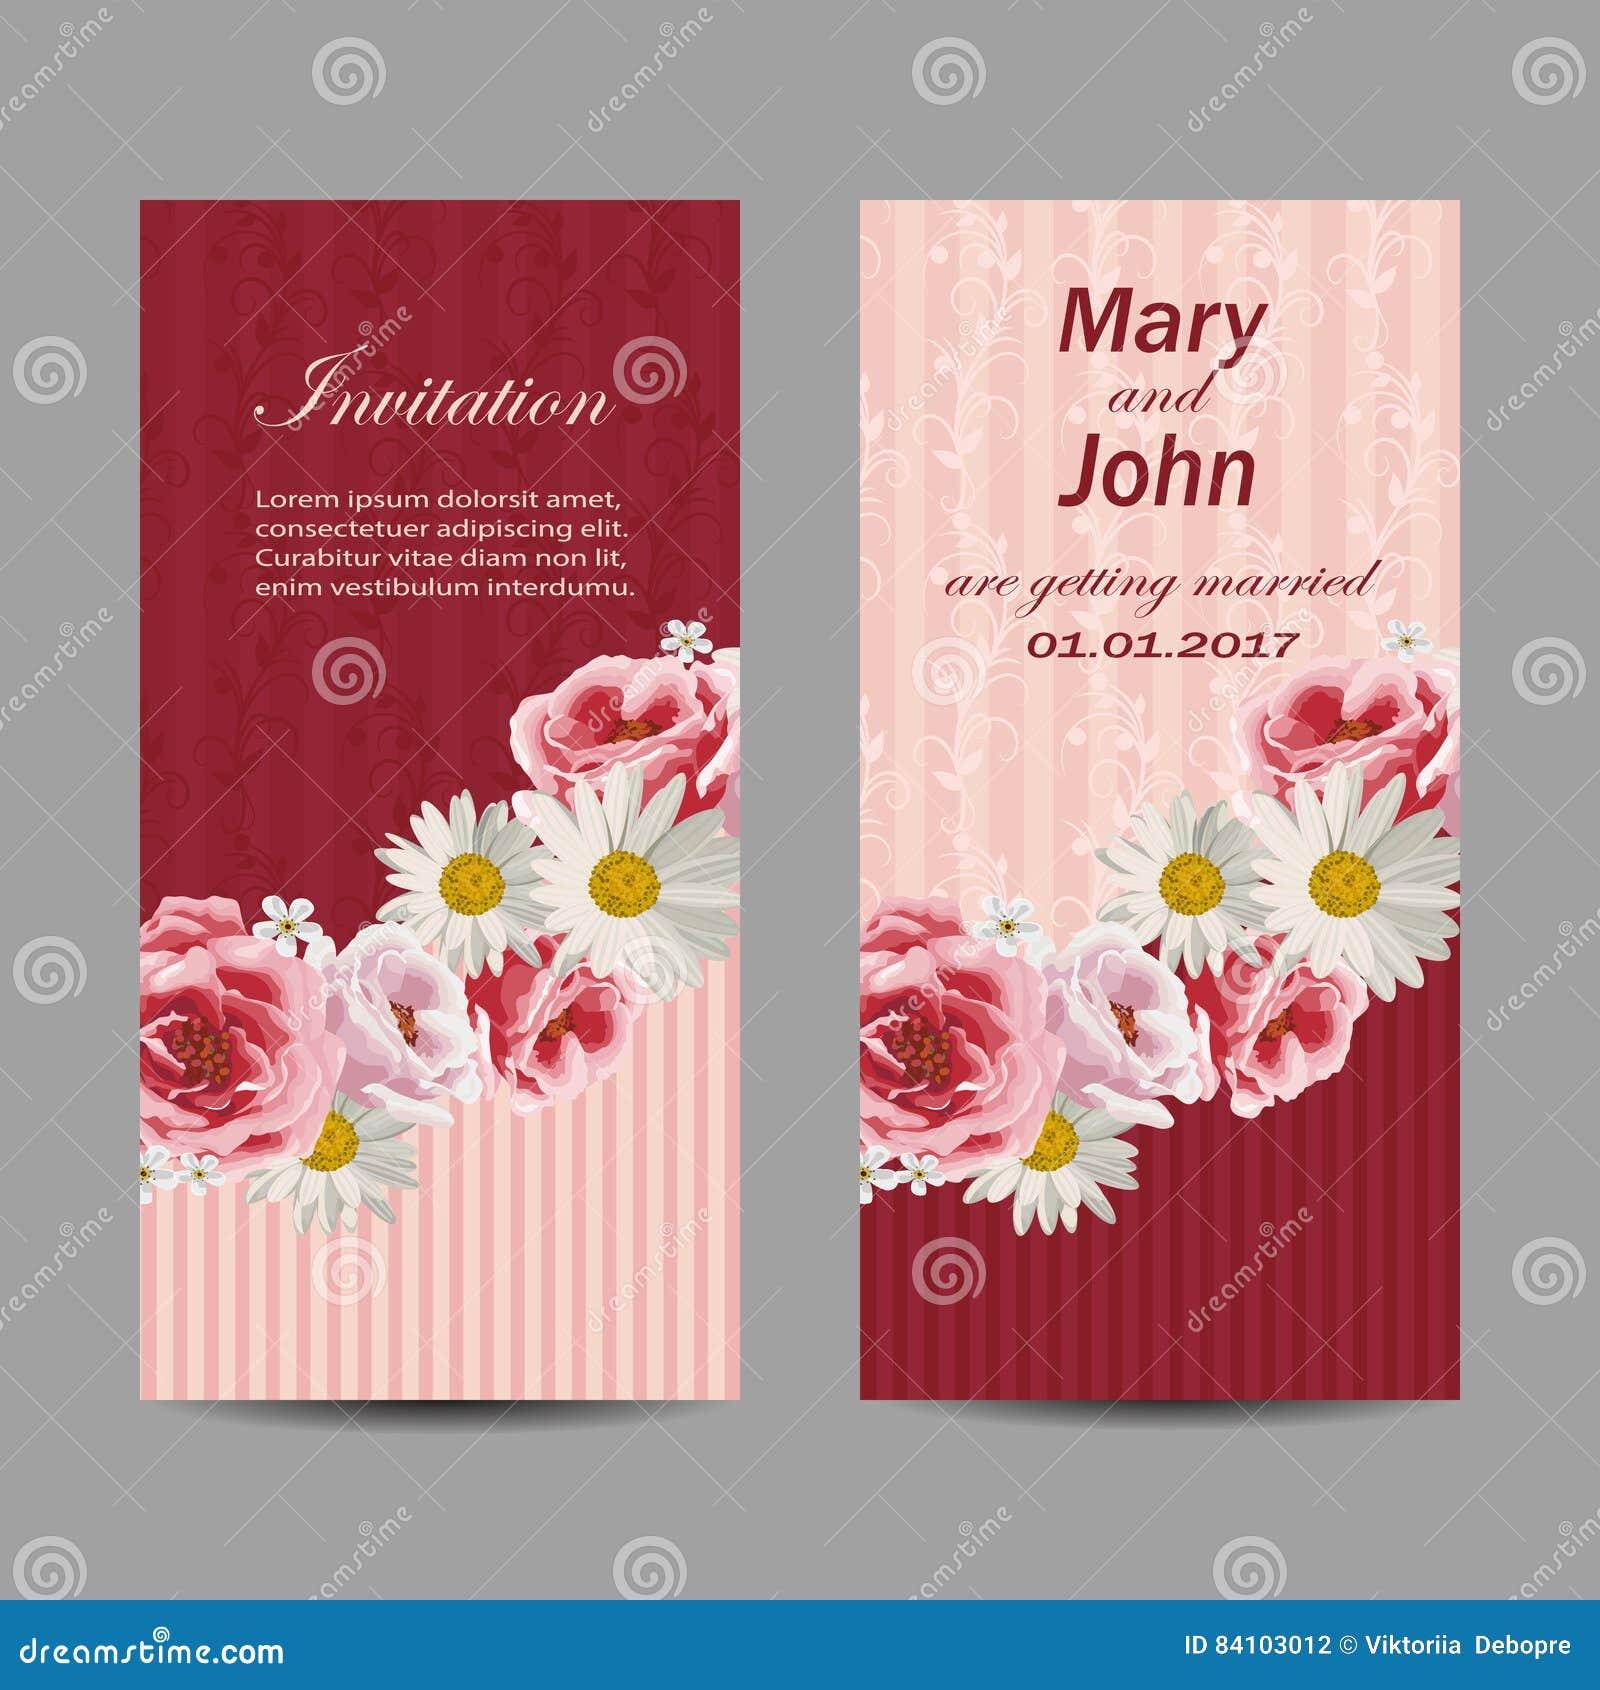 Set Of Wedding Invitation Cards Design. Stock Illustration ...